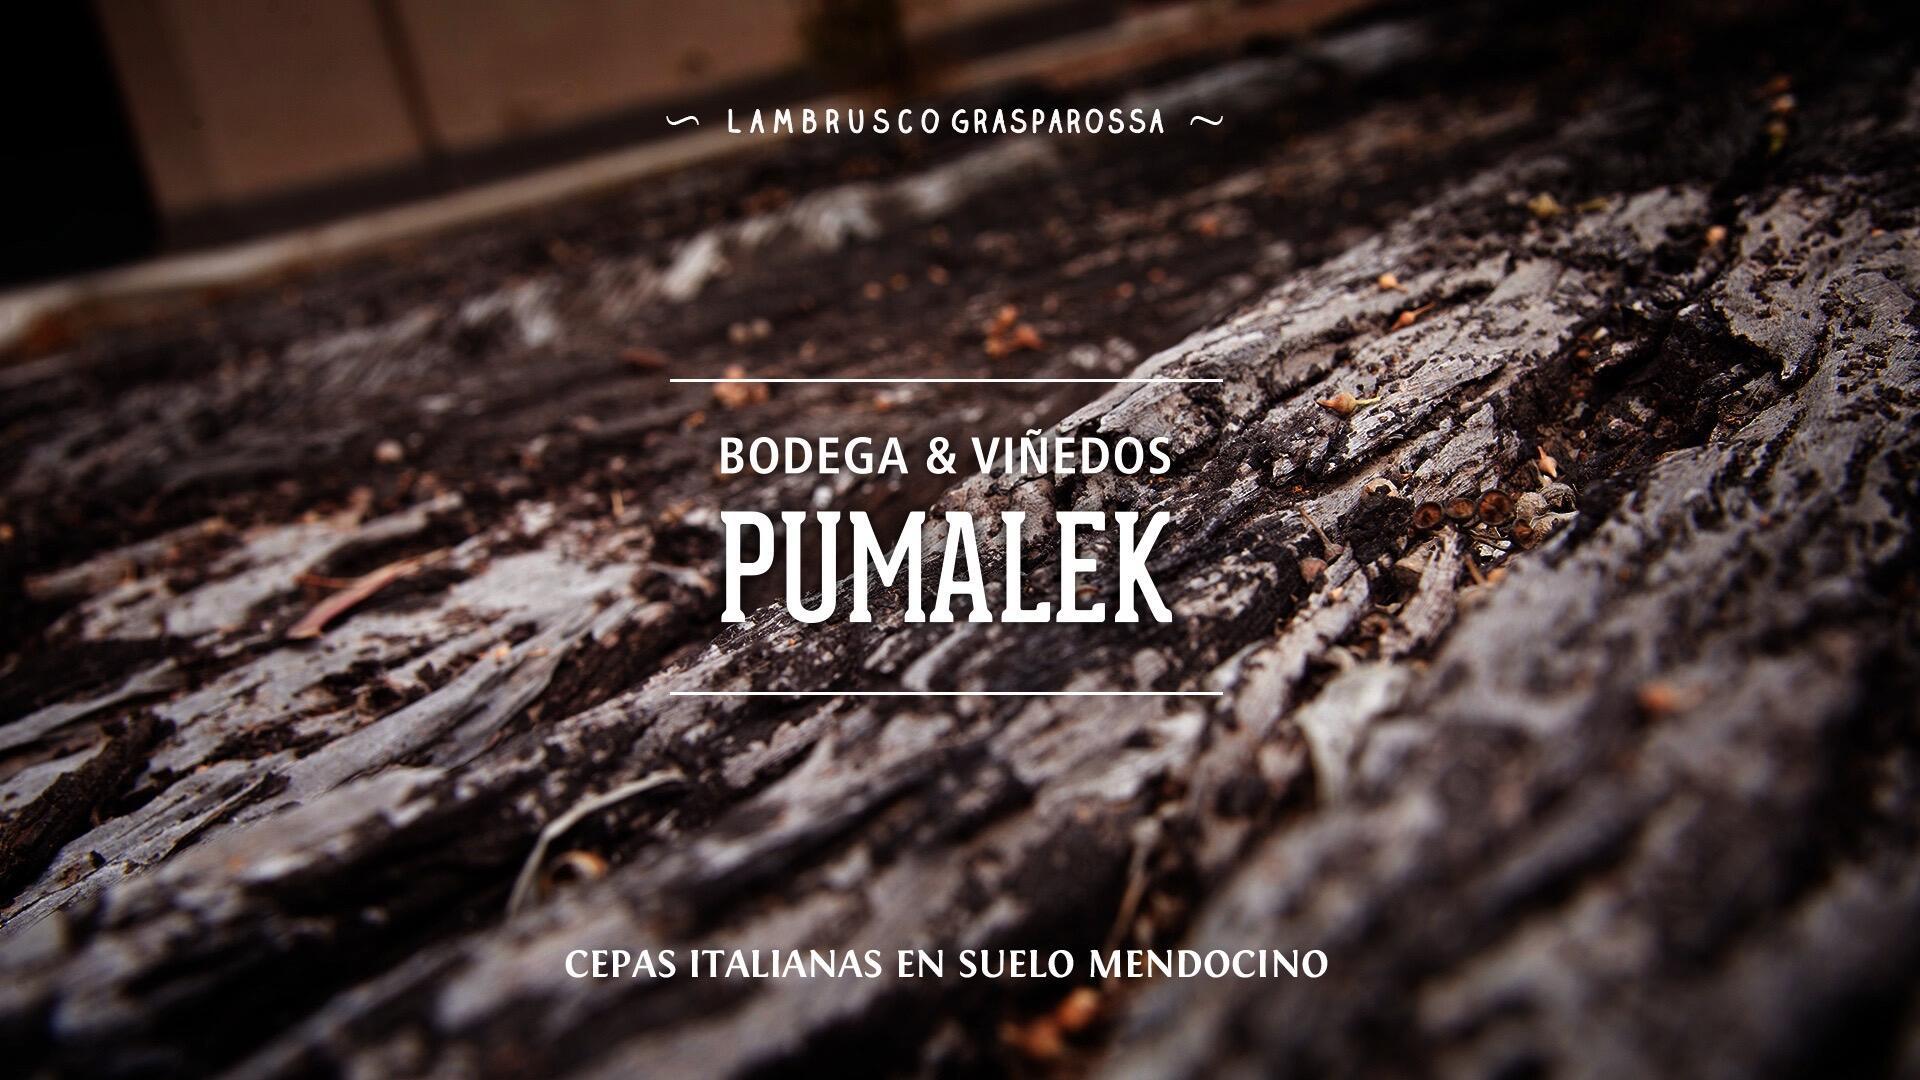 Pumalek Cover Image